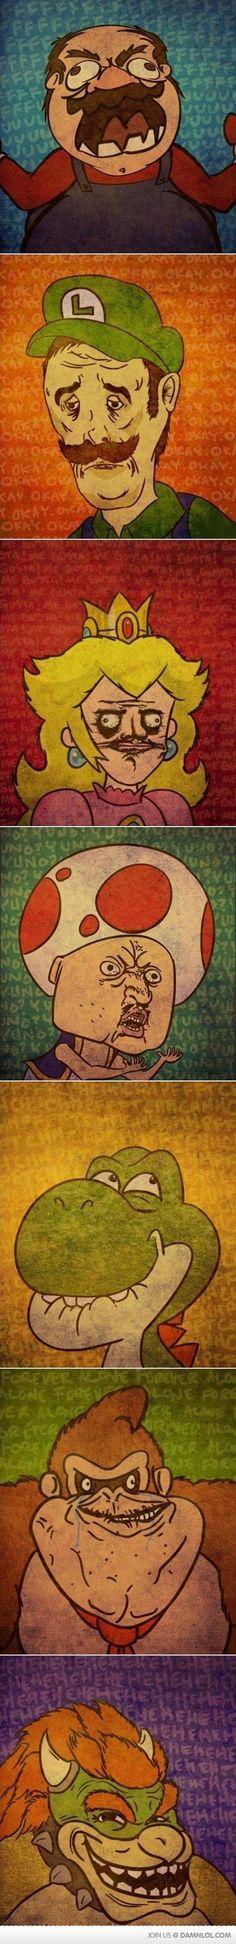 Nintendo Rage Faces Memes   Mario, Luigi, Peach, Toad, Yoshi, DonkeyKong, Bowser